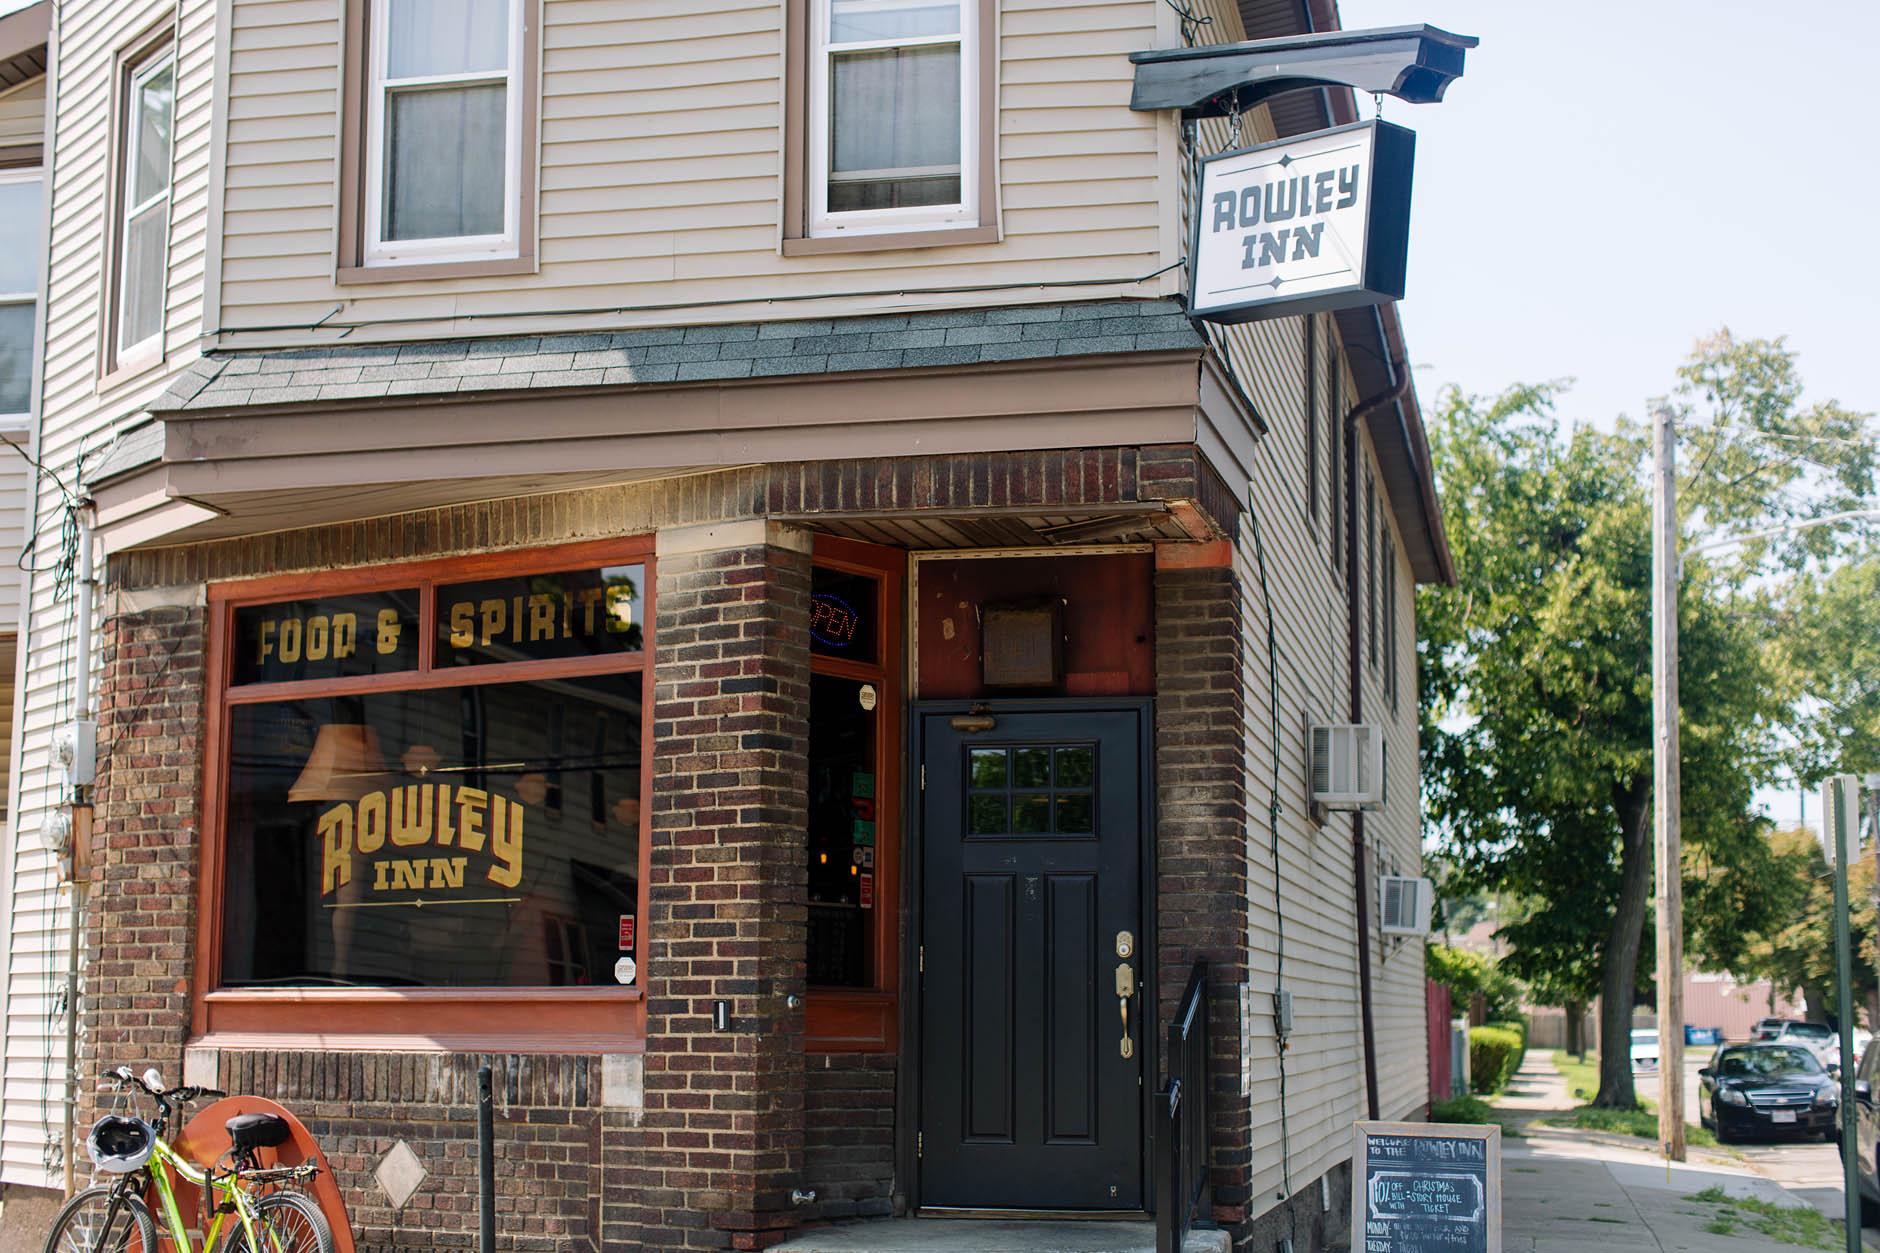 Your Neighborhood: Rowley Inn